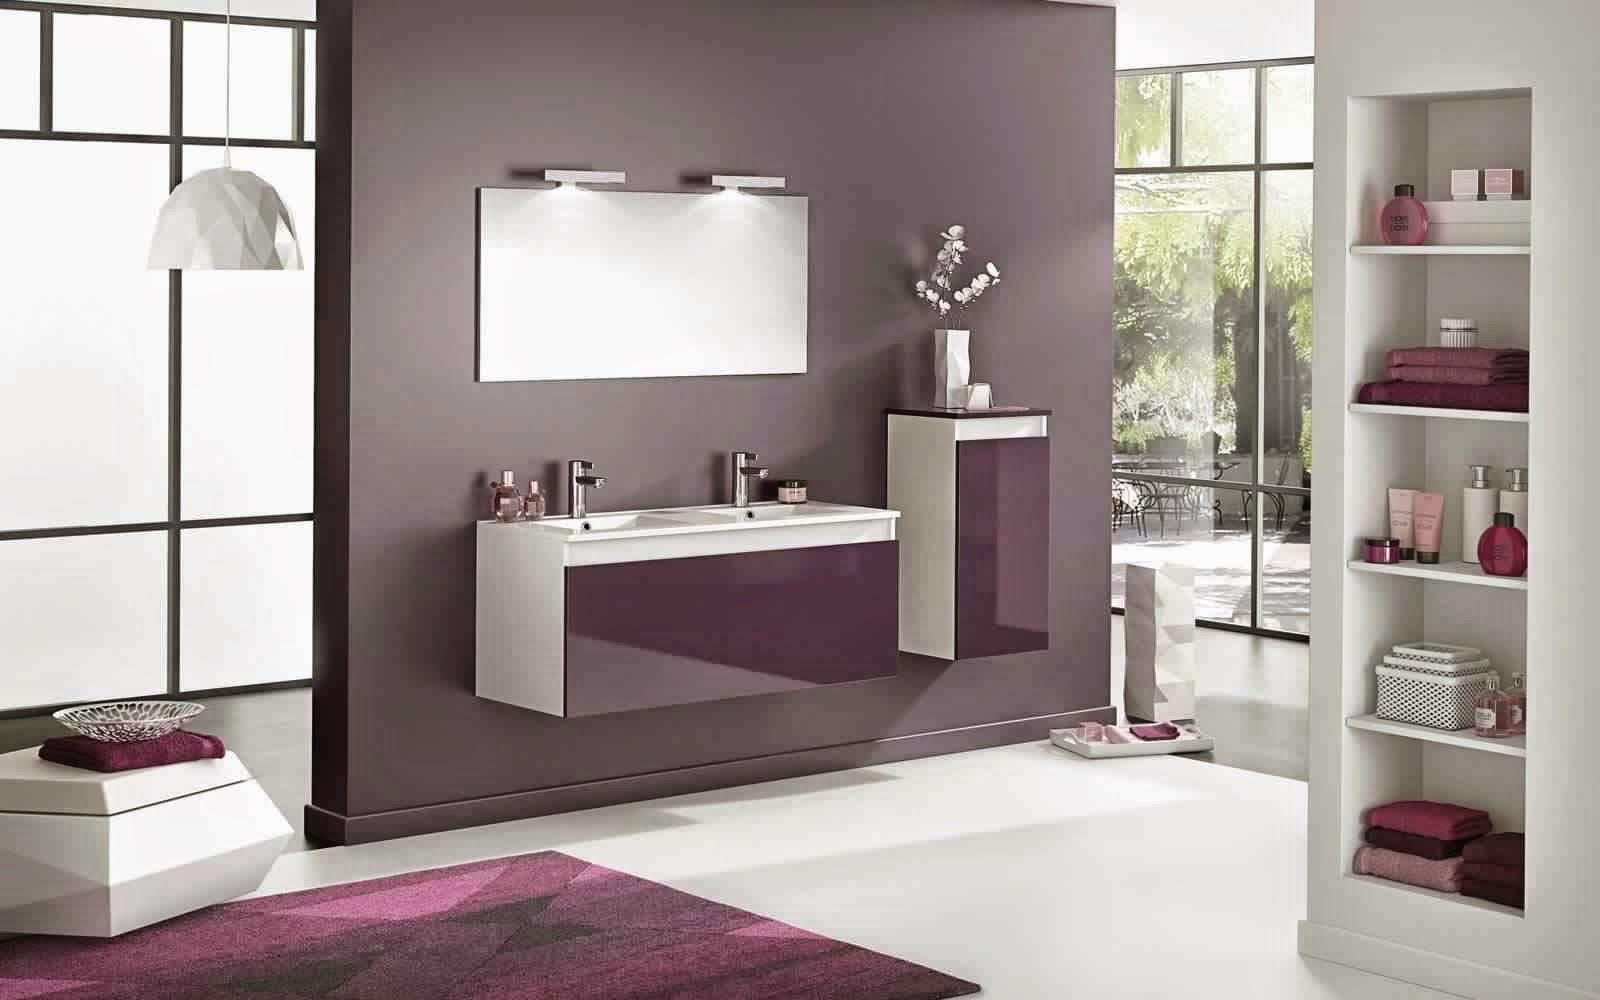 Meubles de salle de bain meuble d coration maison for Meuble salle d bain